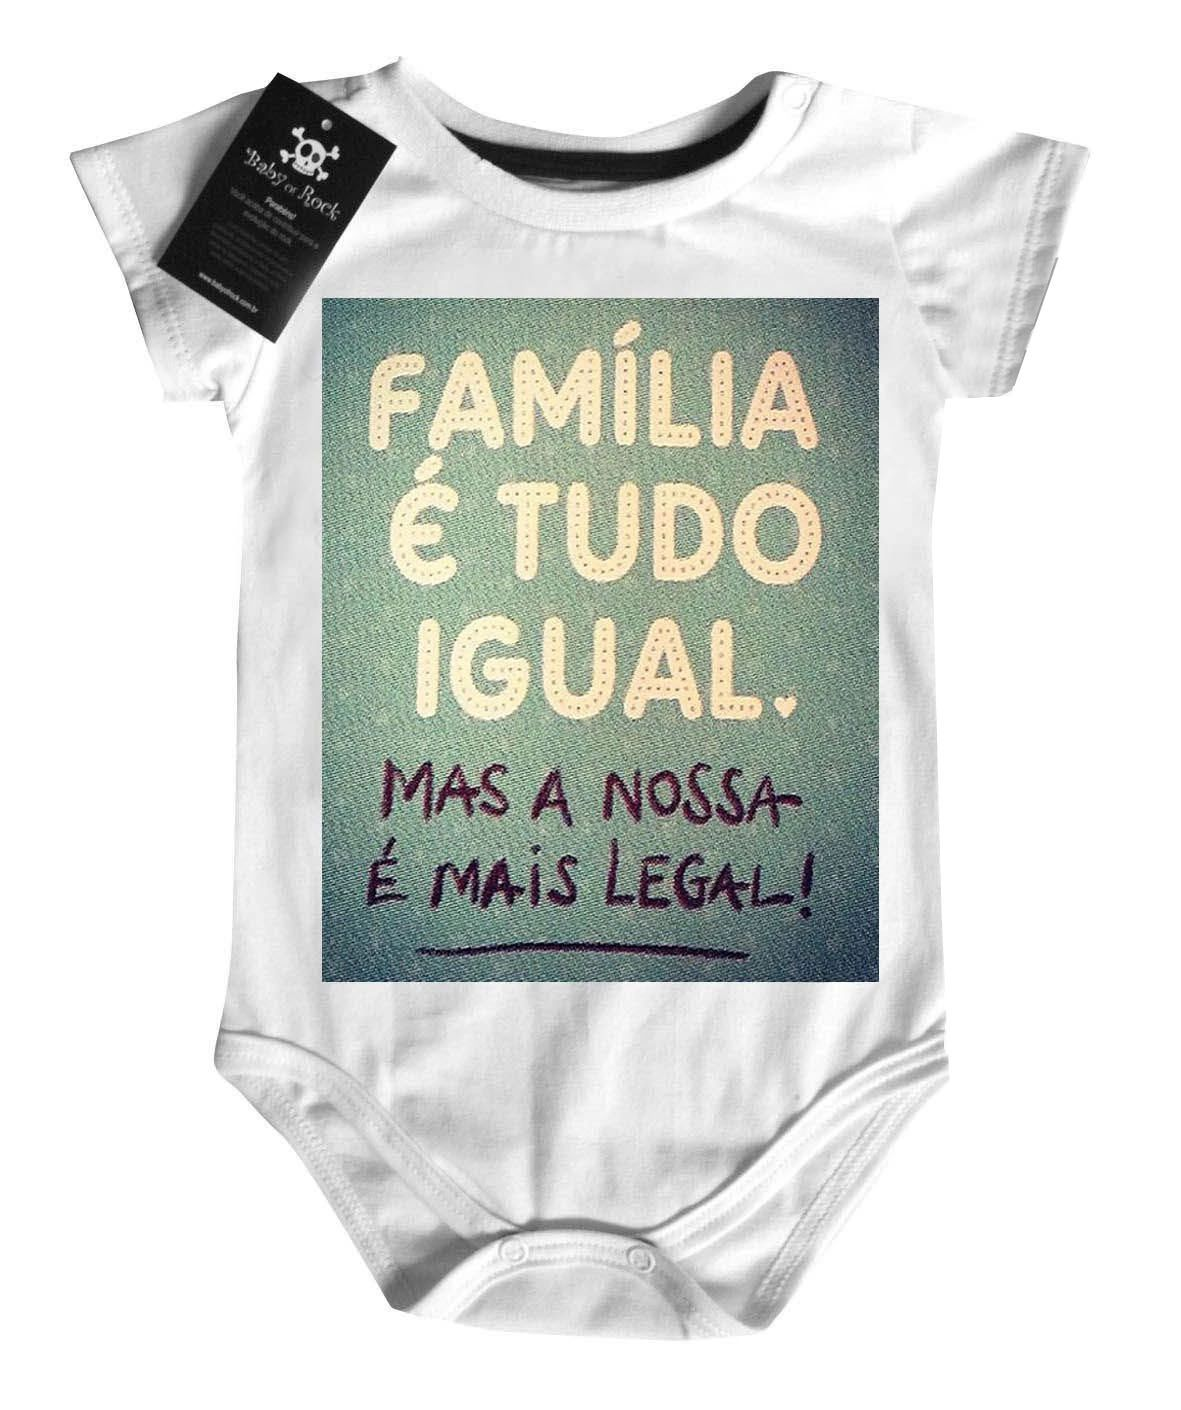 Body  Infantil - Família tudo igual   - White  - Baby Monster S/A